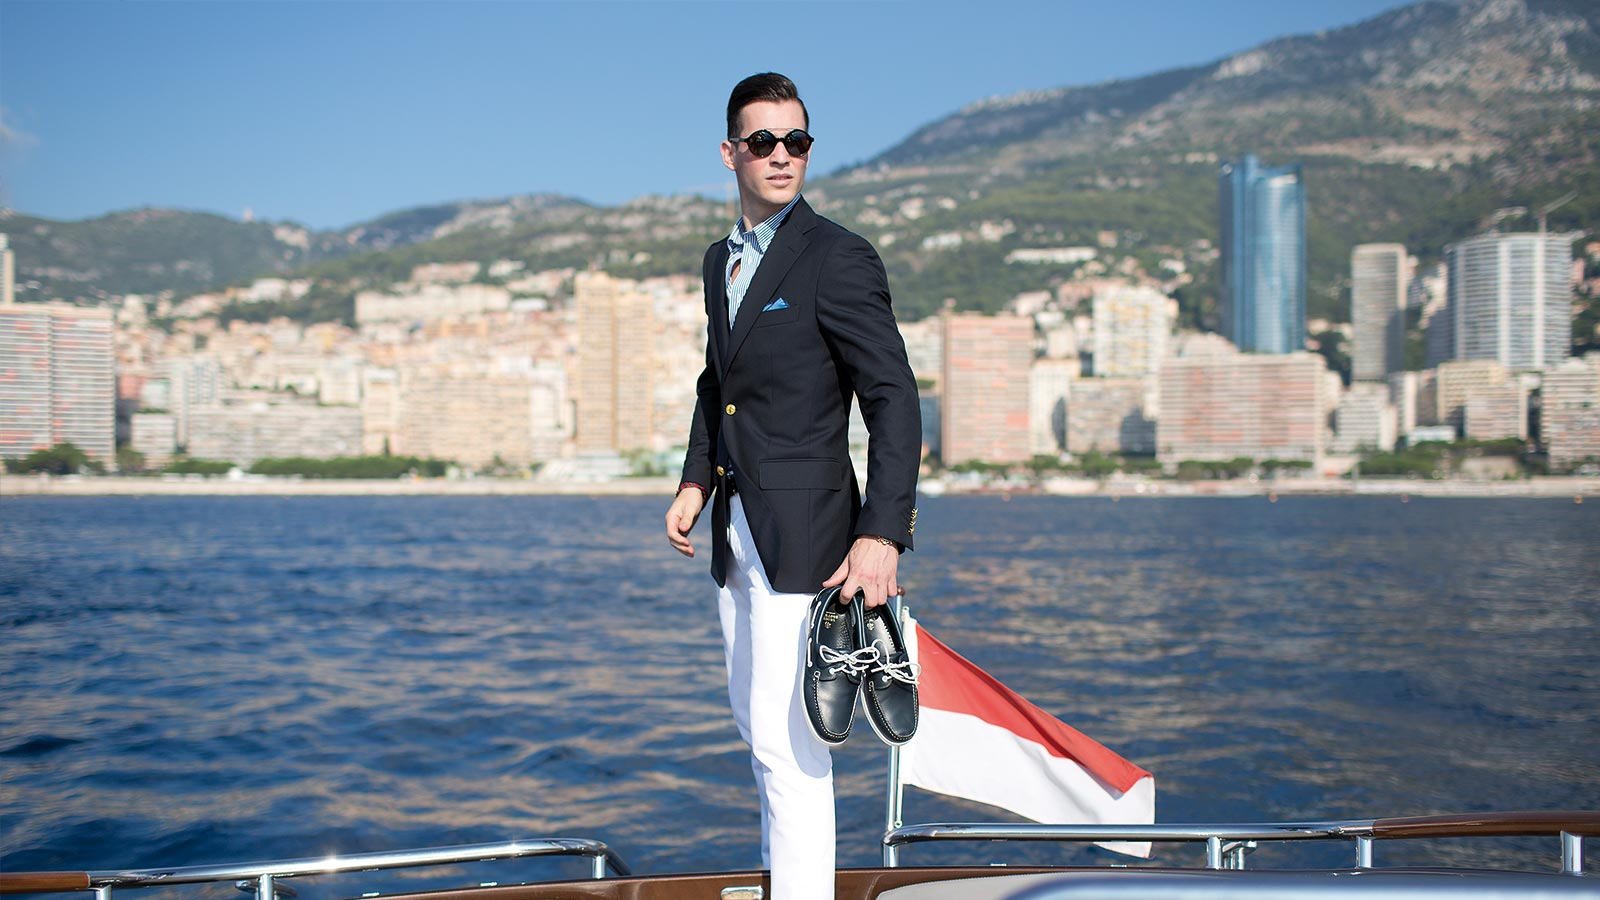 Tom Claeren – Influenceur à Monaco